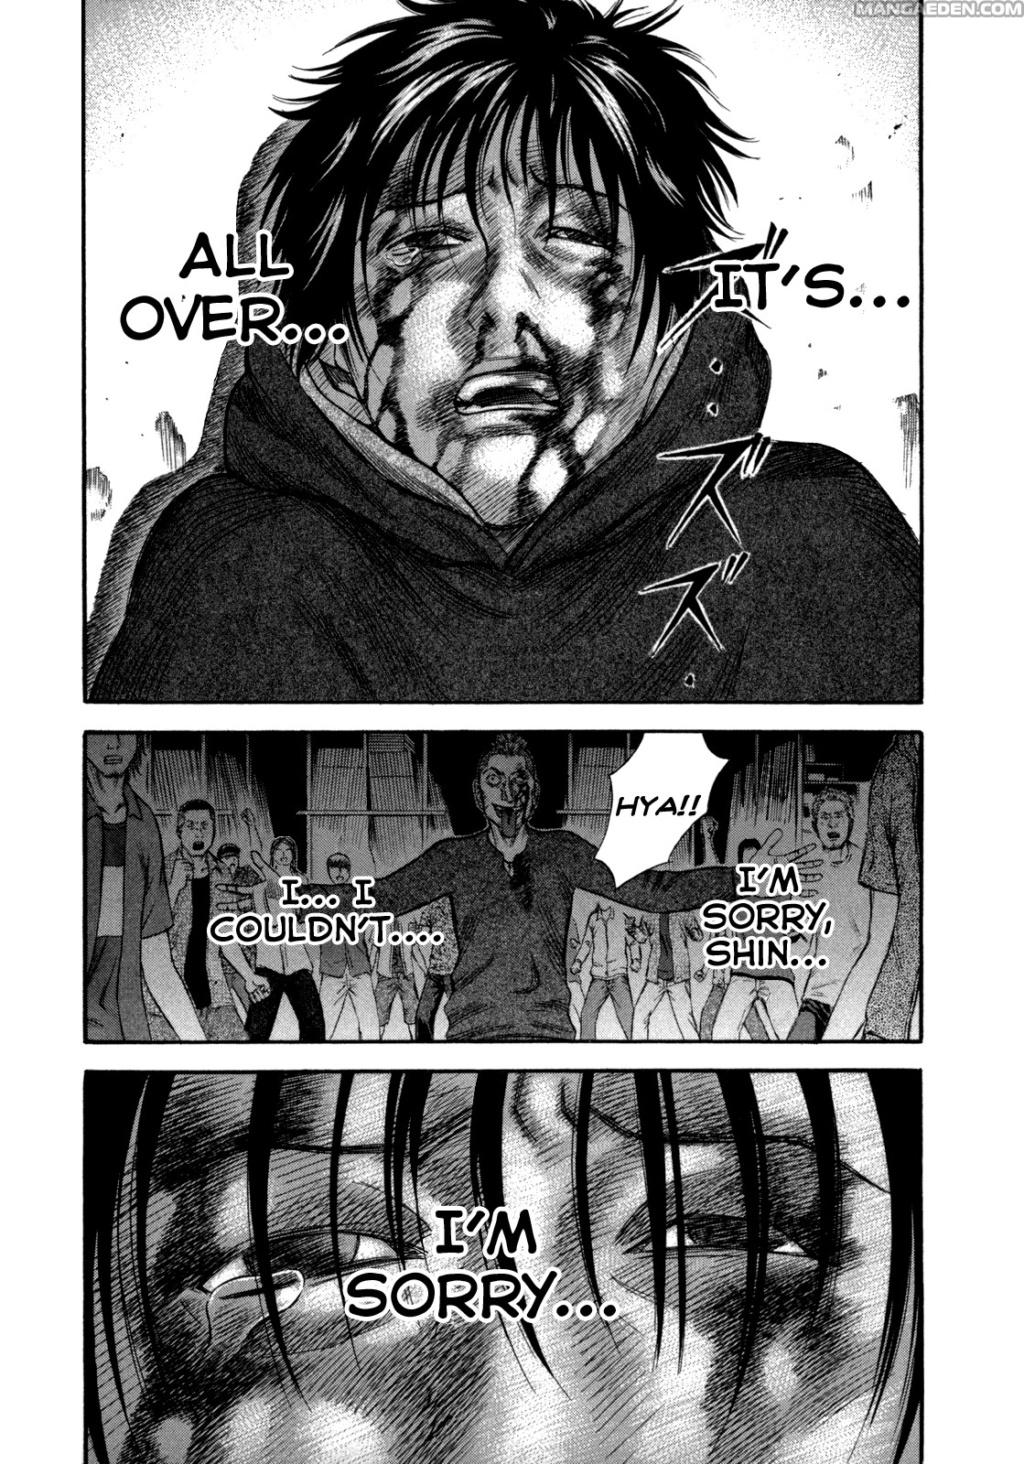 × Dark Storm × .. حيـن تعـصـف ريـآح الـإبدآع ! | فريق ترجمة المانجا - صفحة 20 Dpsxfw11